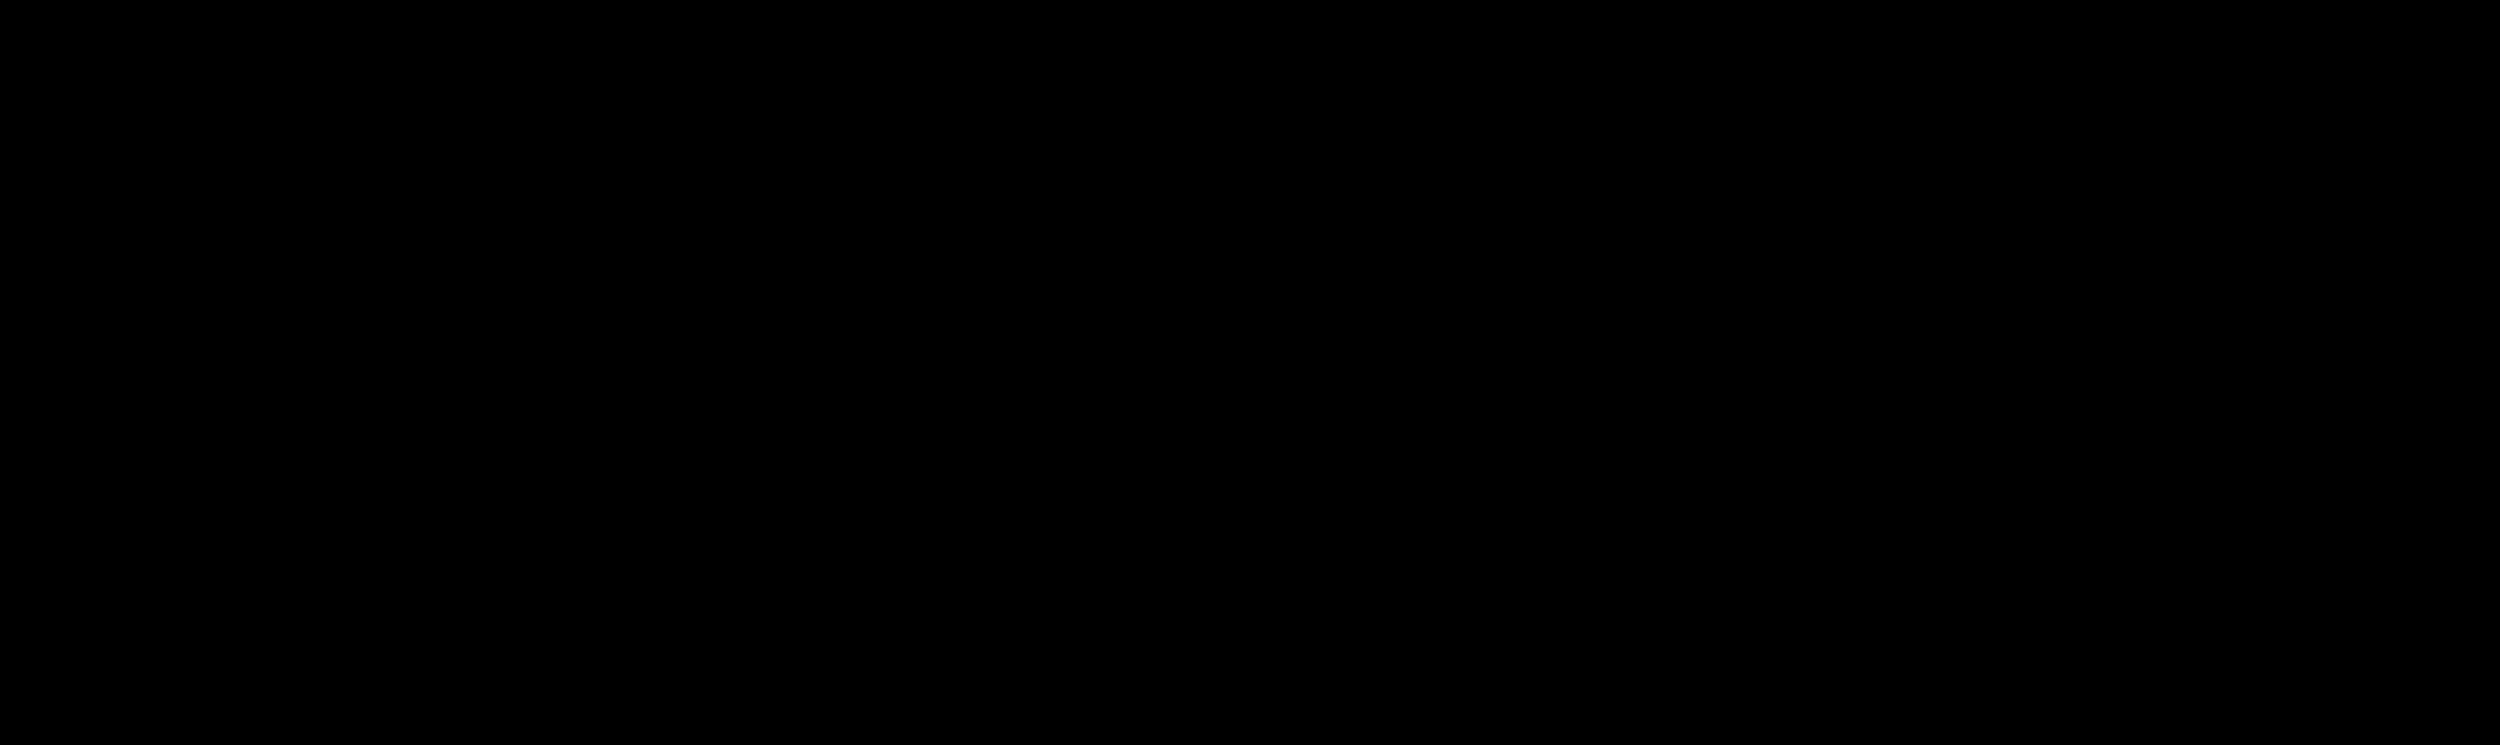 GFCH-Final-Logo_Black.png